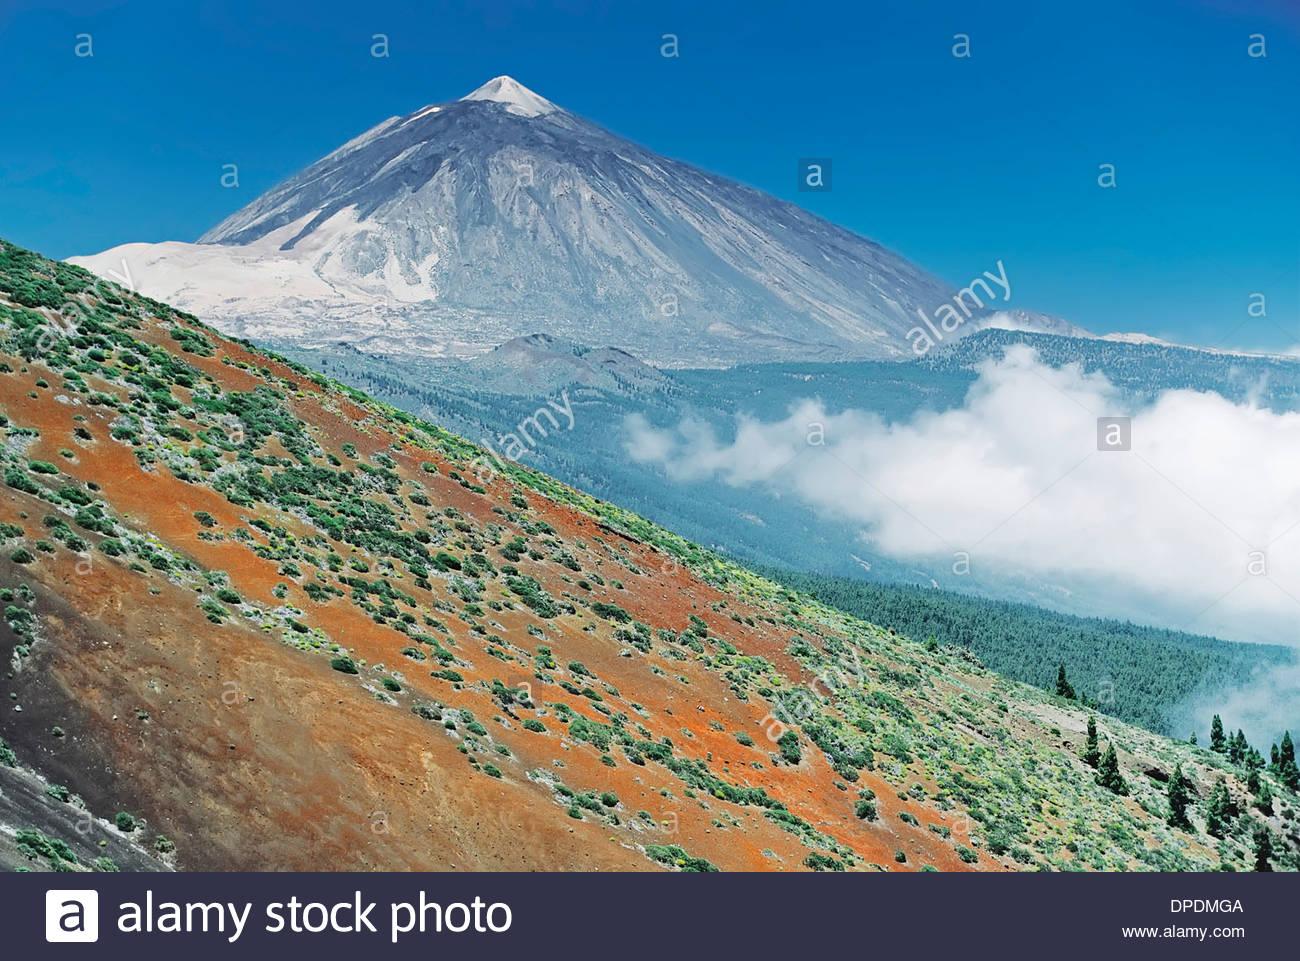 Teide mountain, Tenerife, Canary Islands, Spain - Stock Image